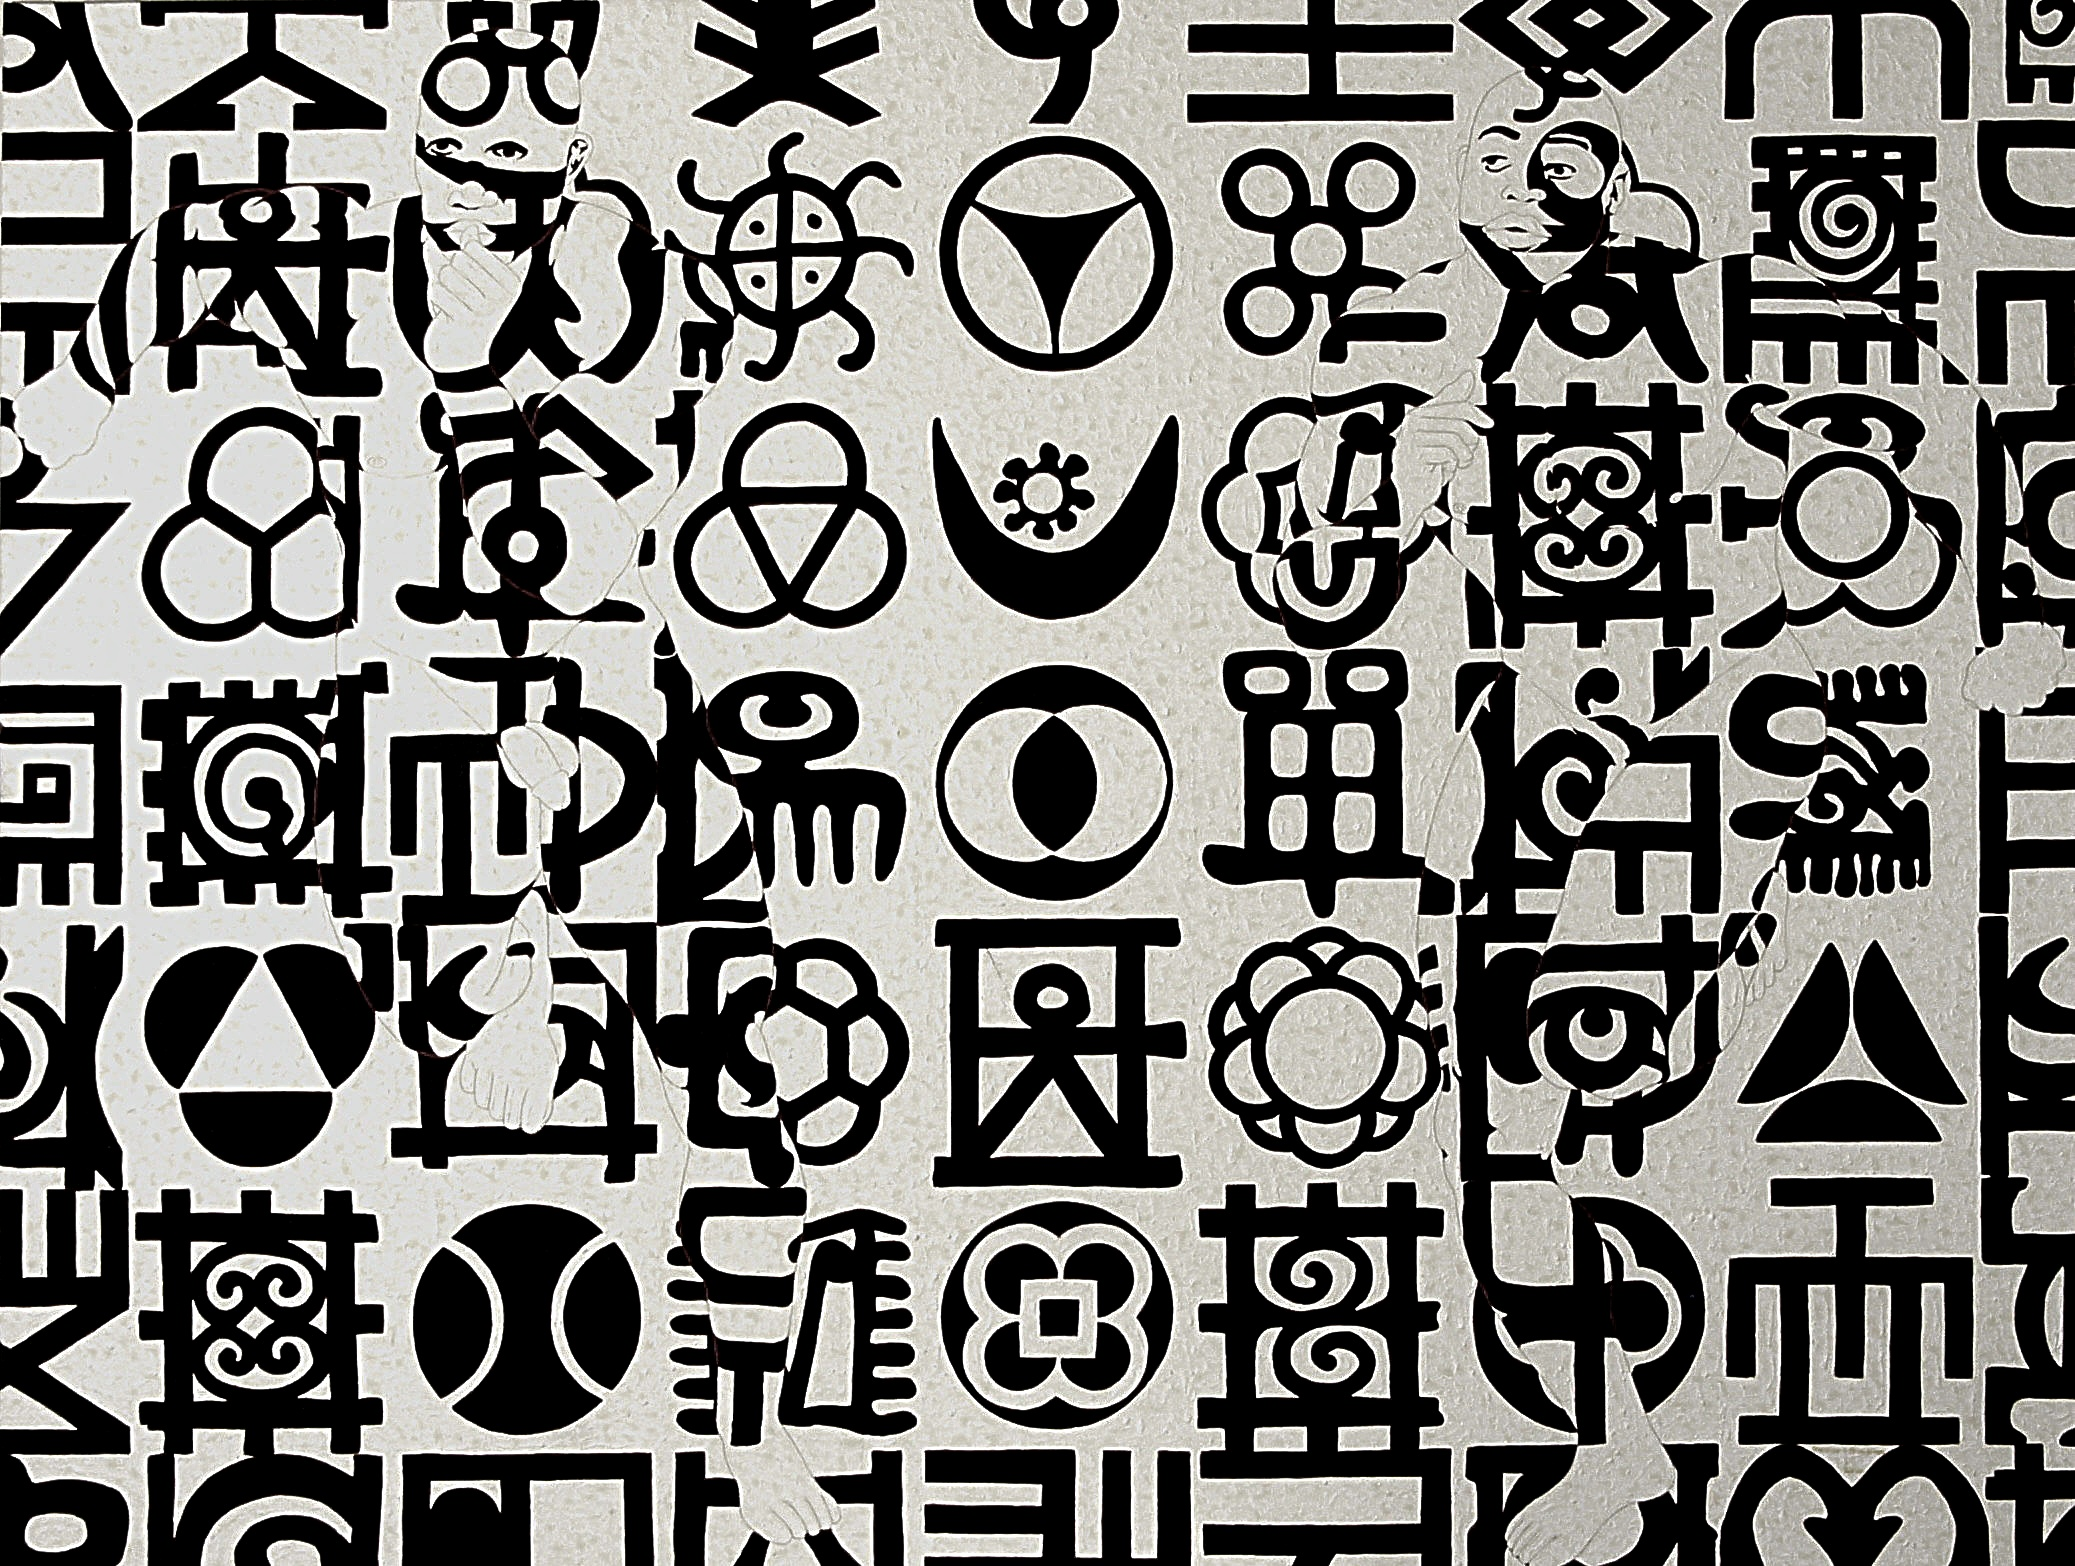 Analogy identifies anomaly: Microcon Begins by Owusu-Ankomah at Skoto Gallery